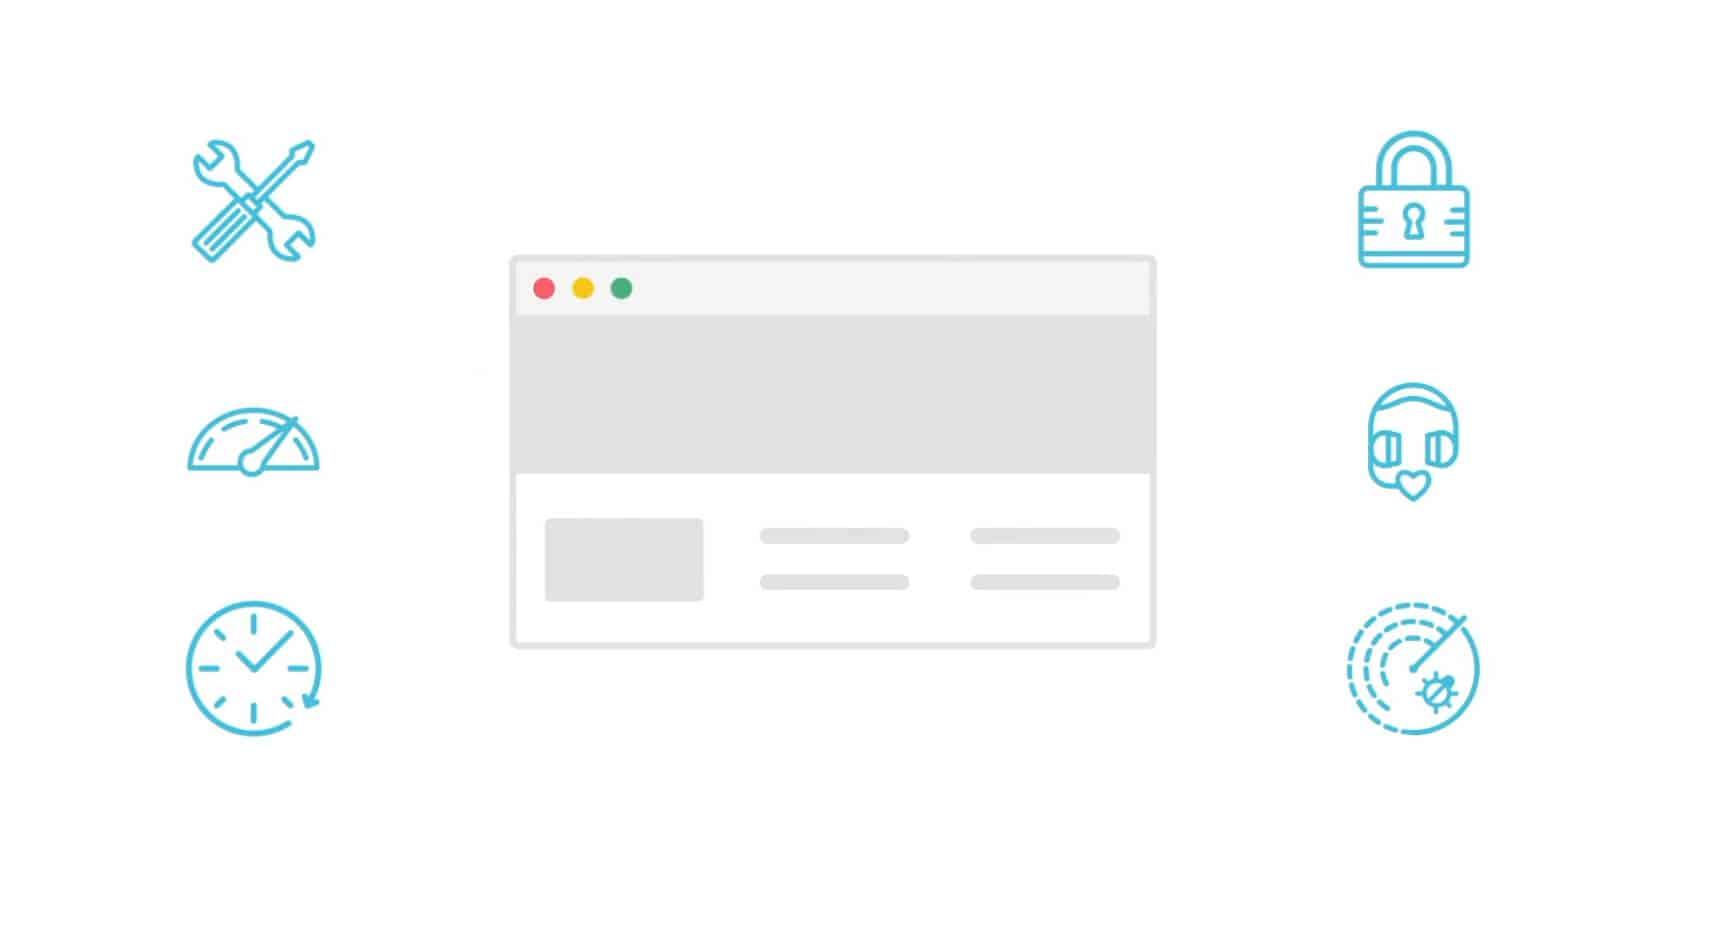 managed-hosting_vimeo-no-watermark